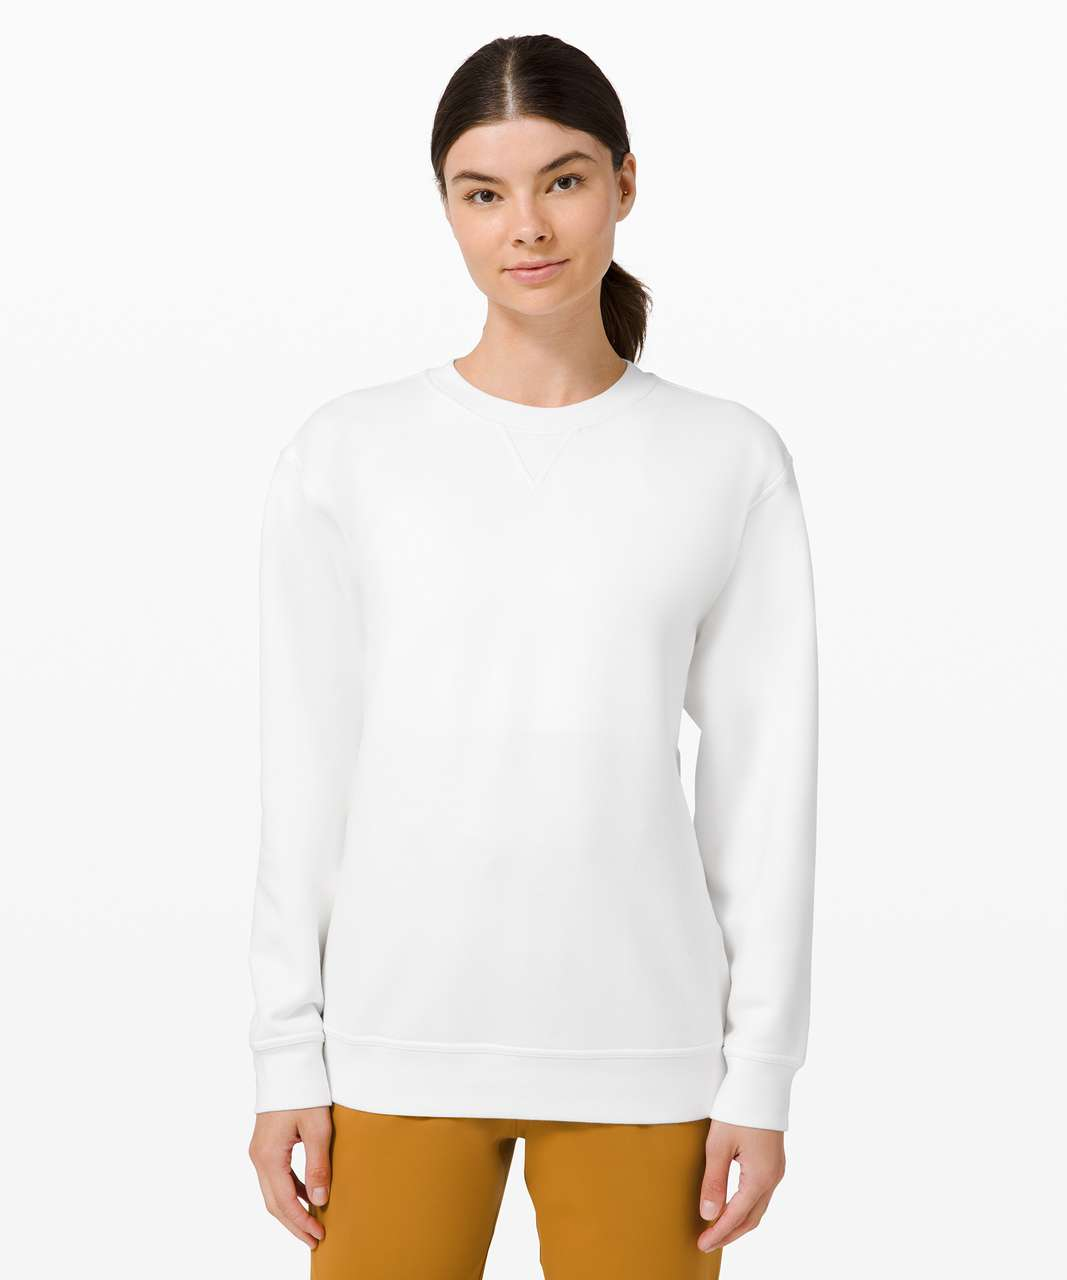 Lululemon All Yours Crew *Fleece - White